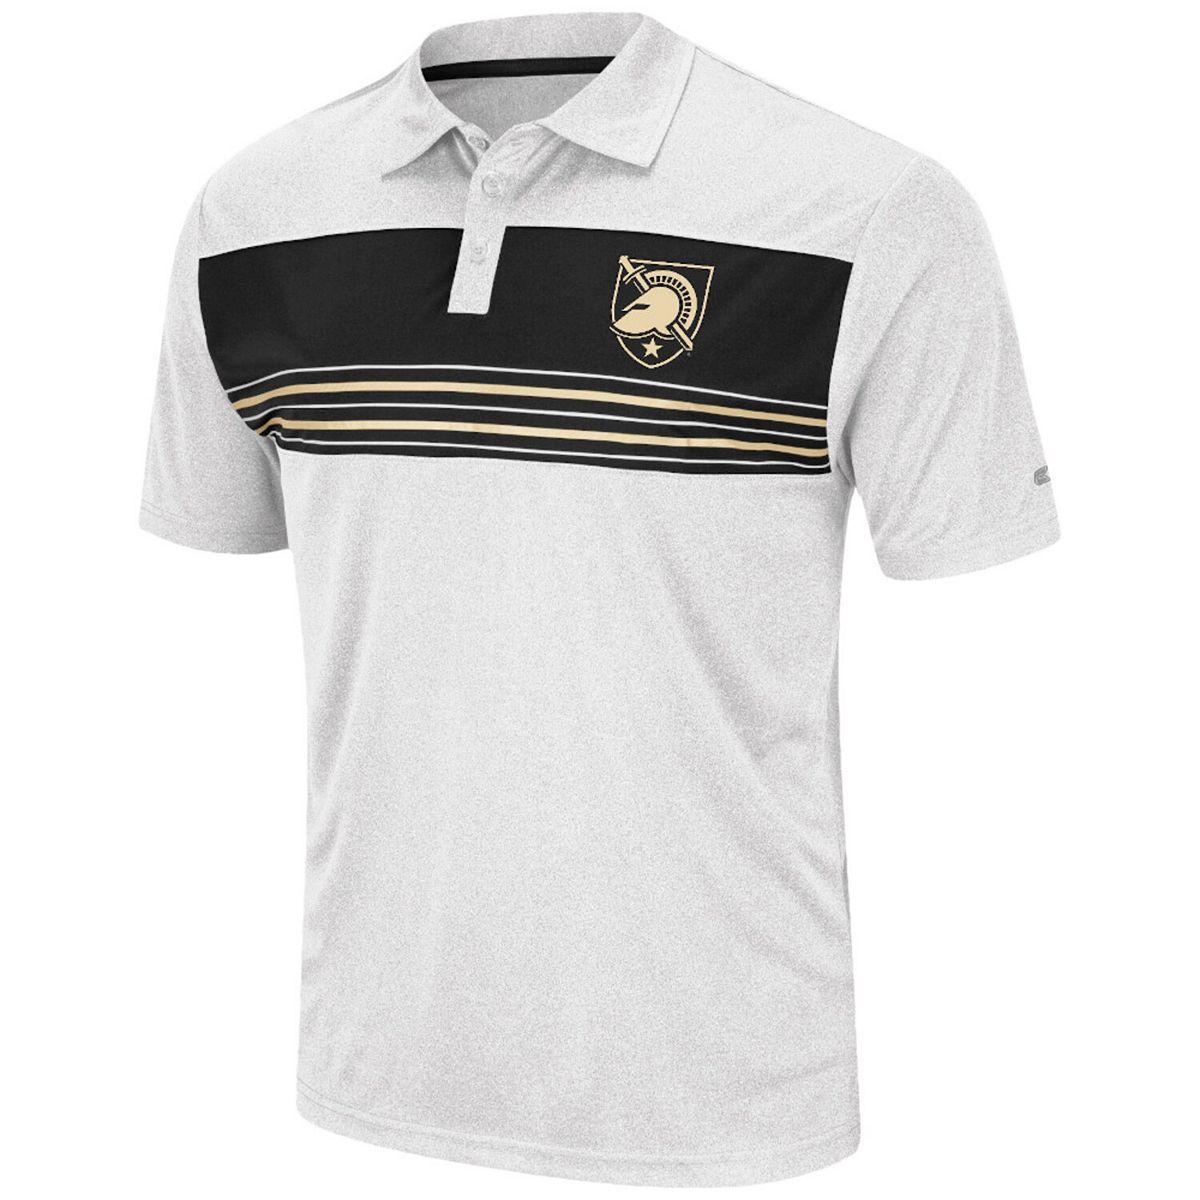 Men's Colosseum White Army Black Knights Brinkley Polo dNbGi